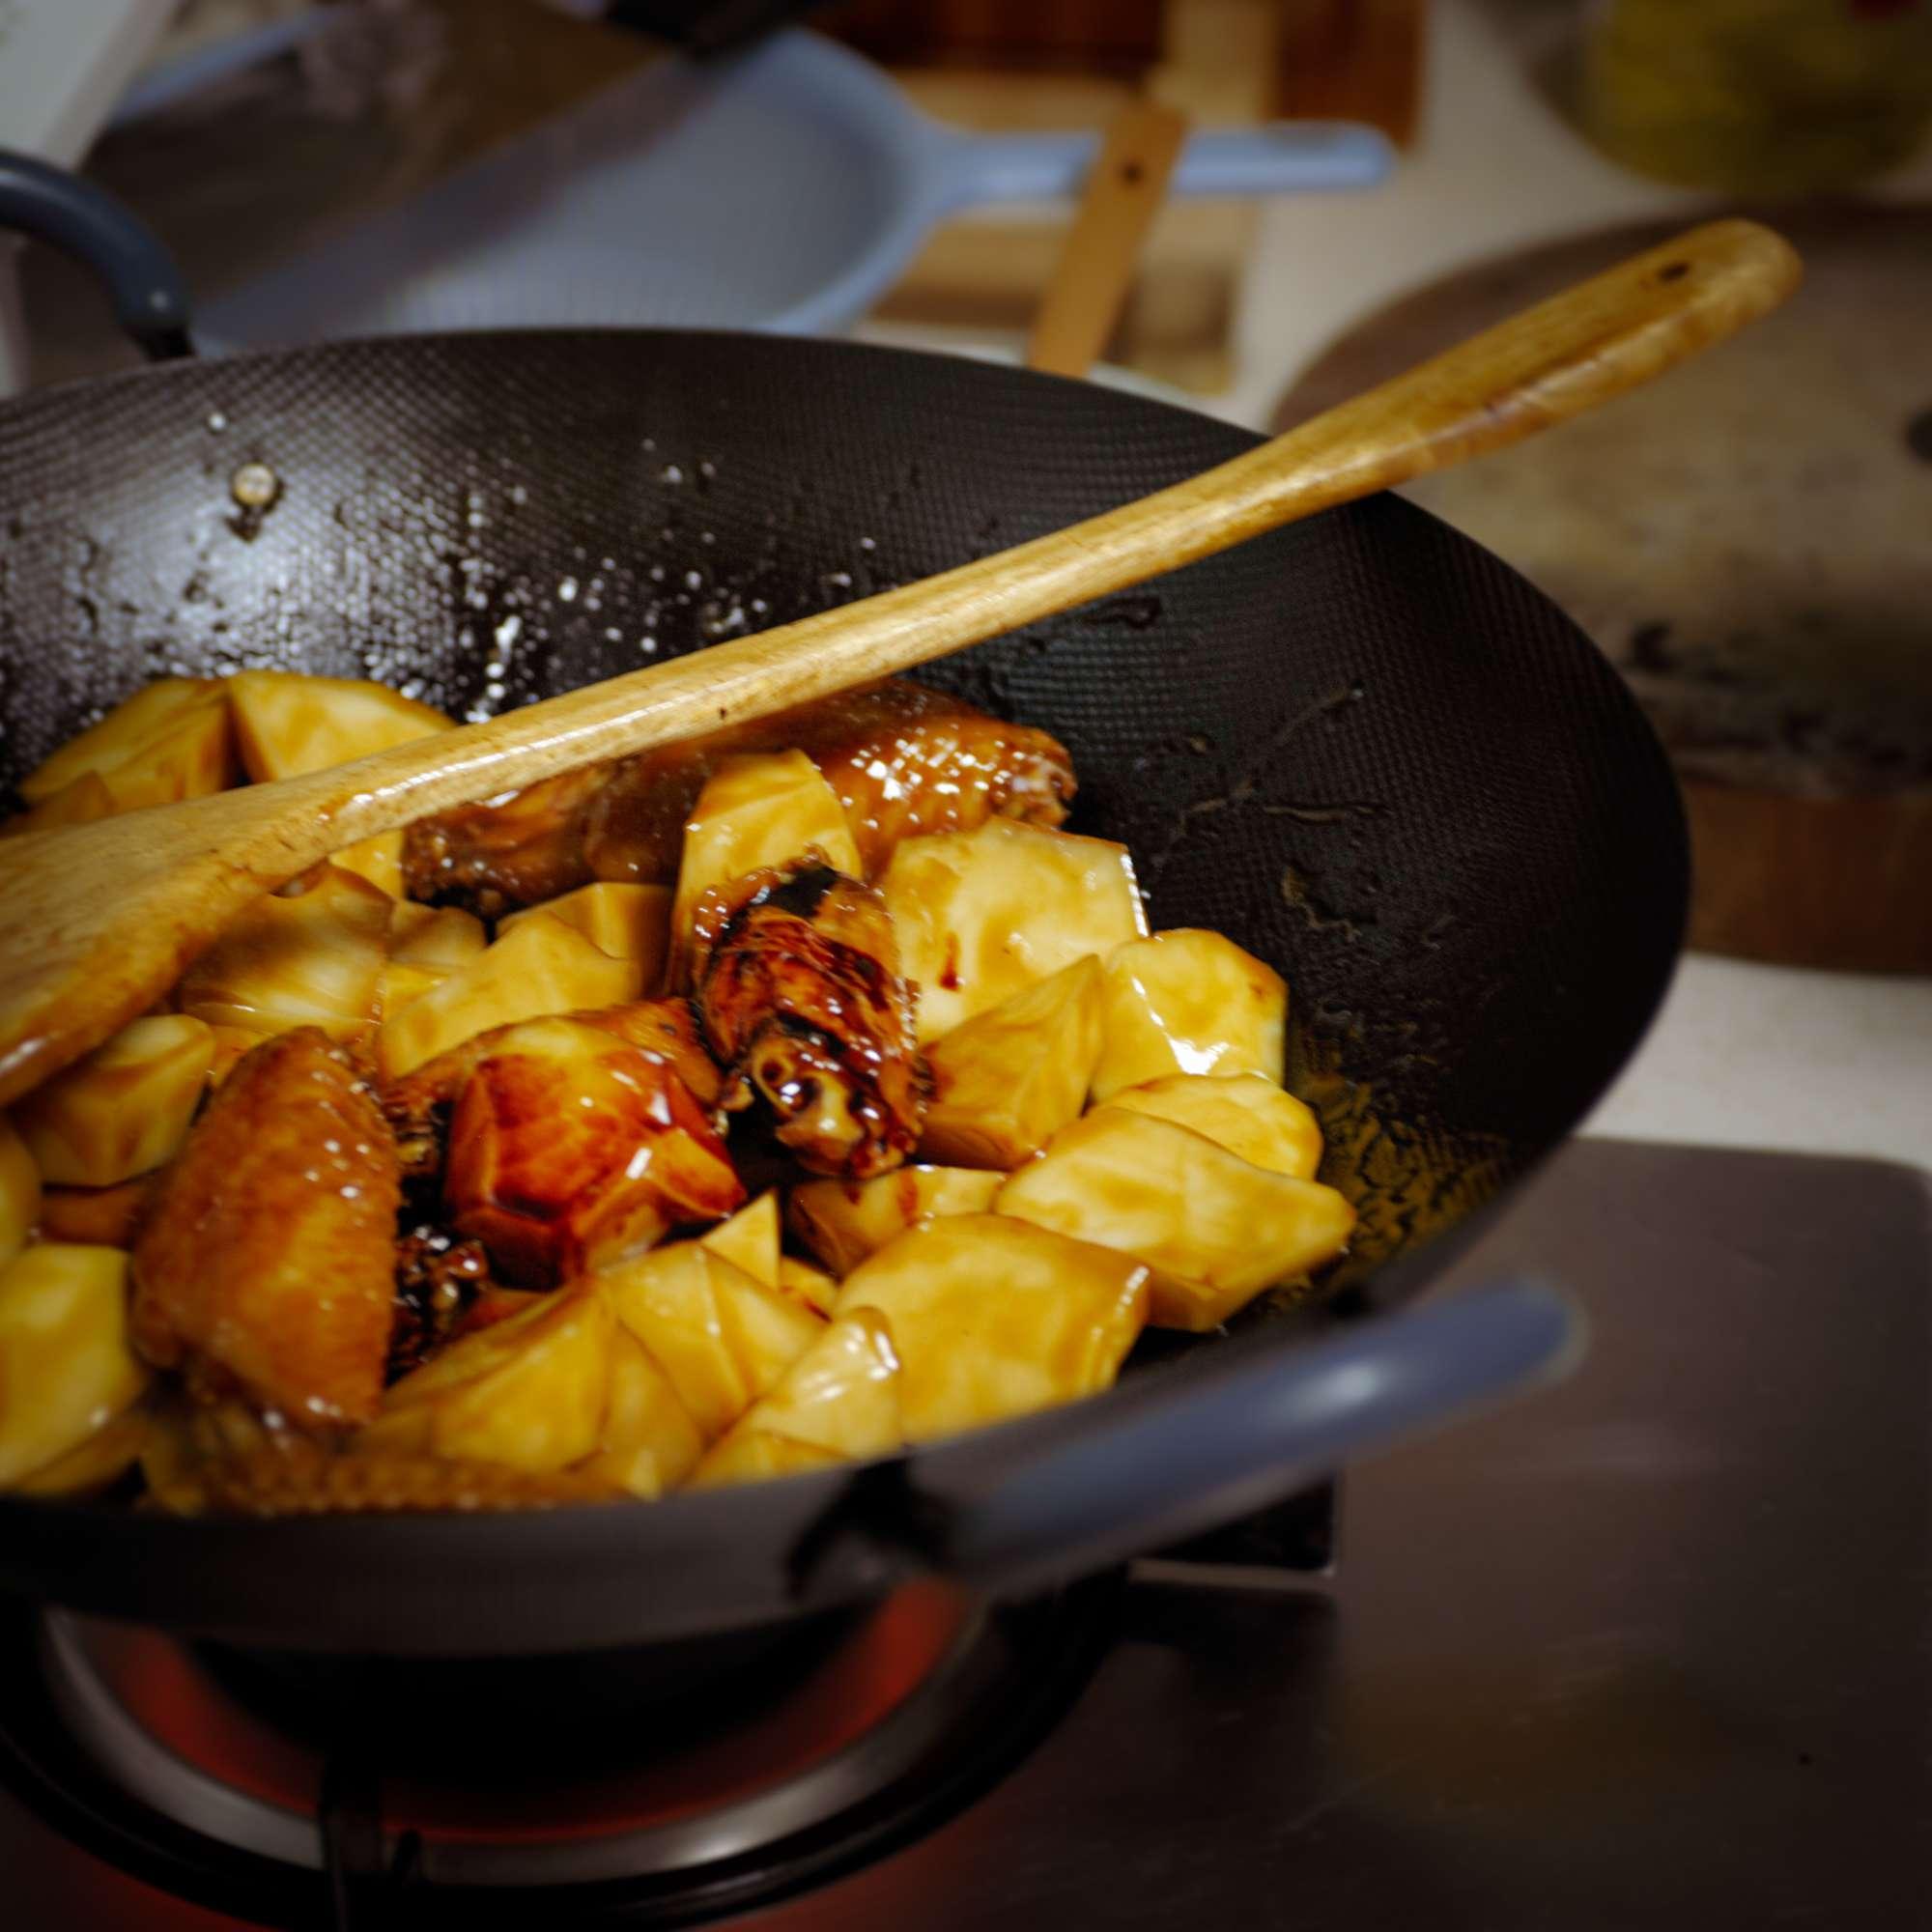 Jichiduntudou– Hühnchen mit Kartoffeln